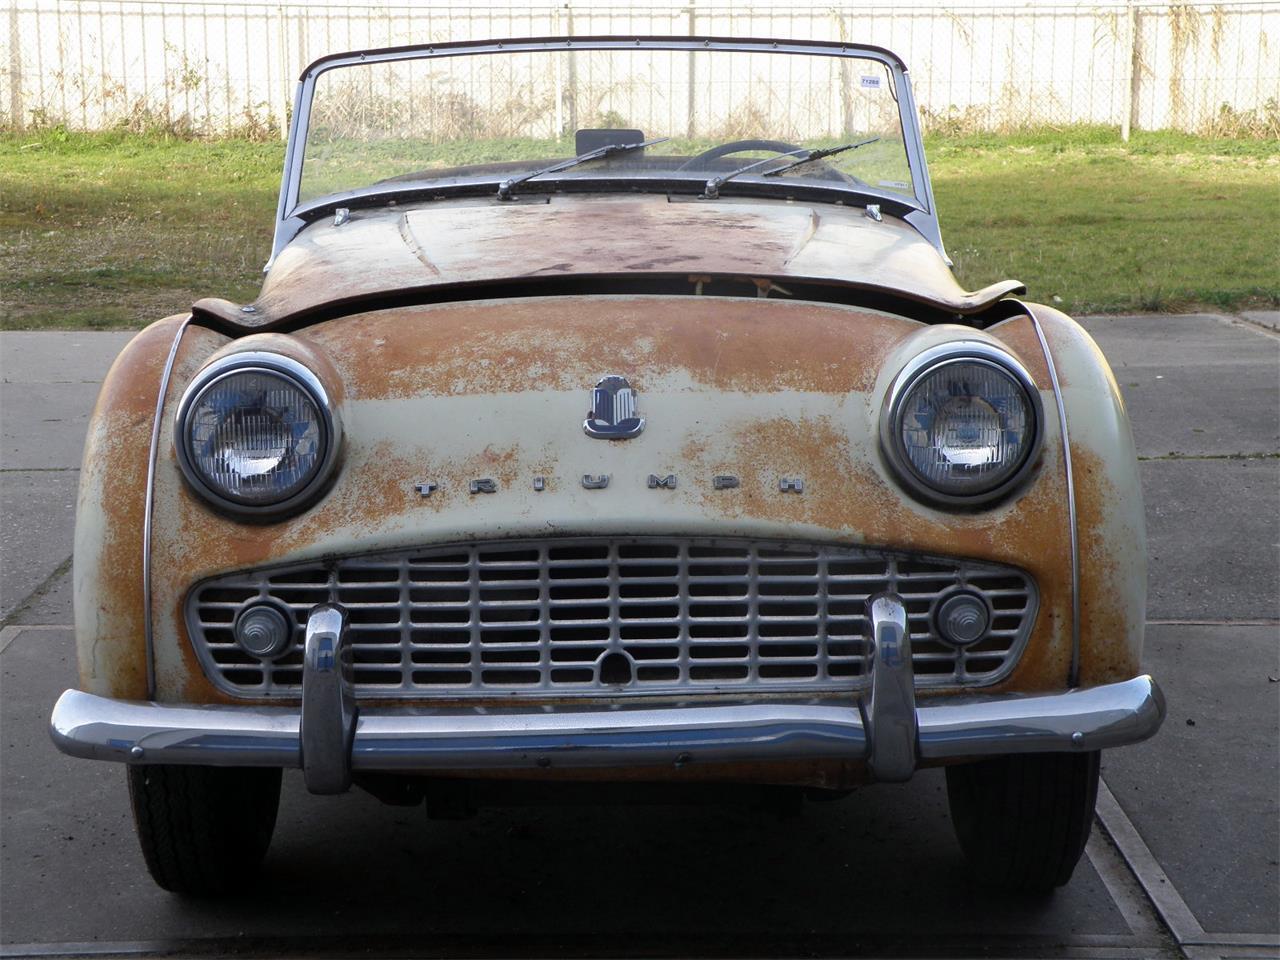 1959 Triumph Tr3a For Sale Classiccarscom Cc 937913